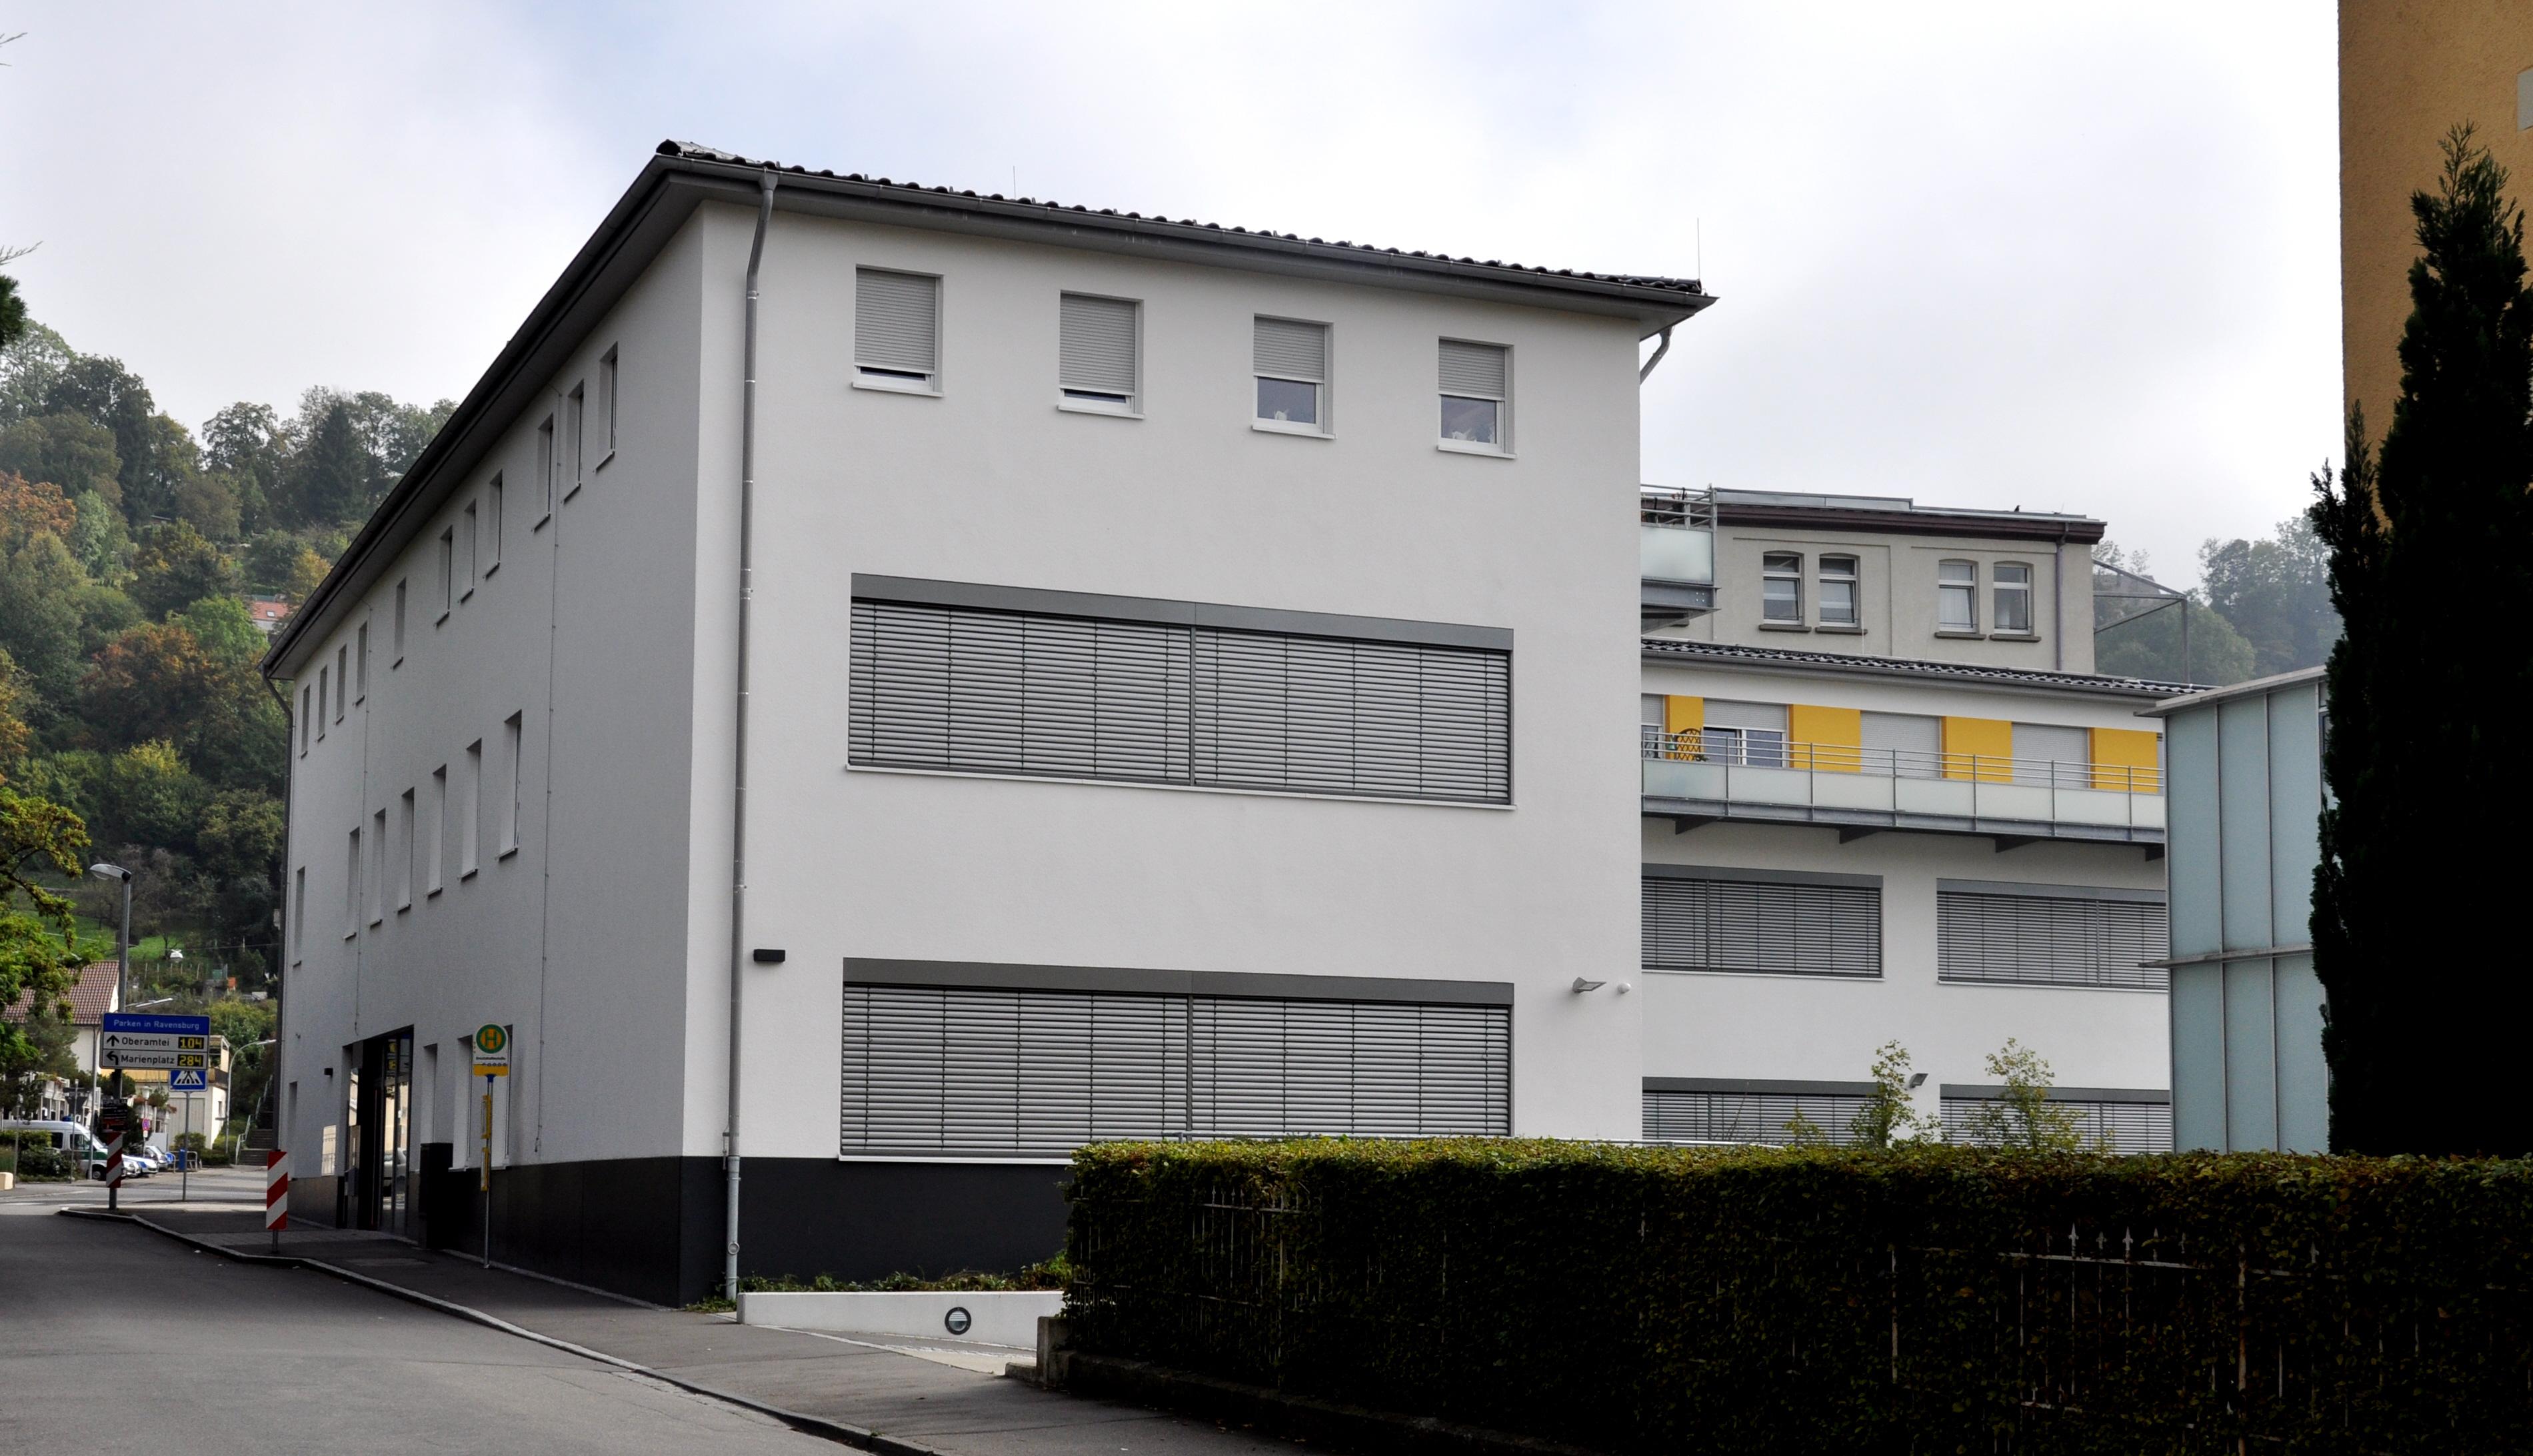 File:Ravensburg Rudolfstraße11 Neubau.jpg - Wikimedia Commons